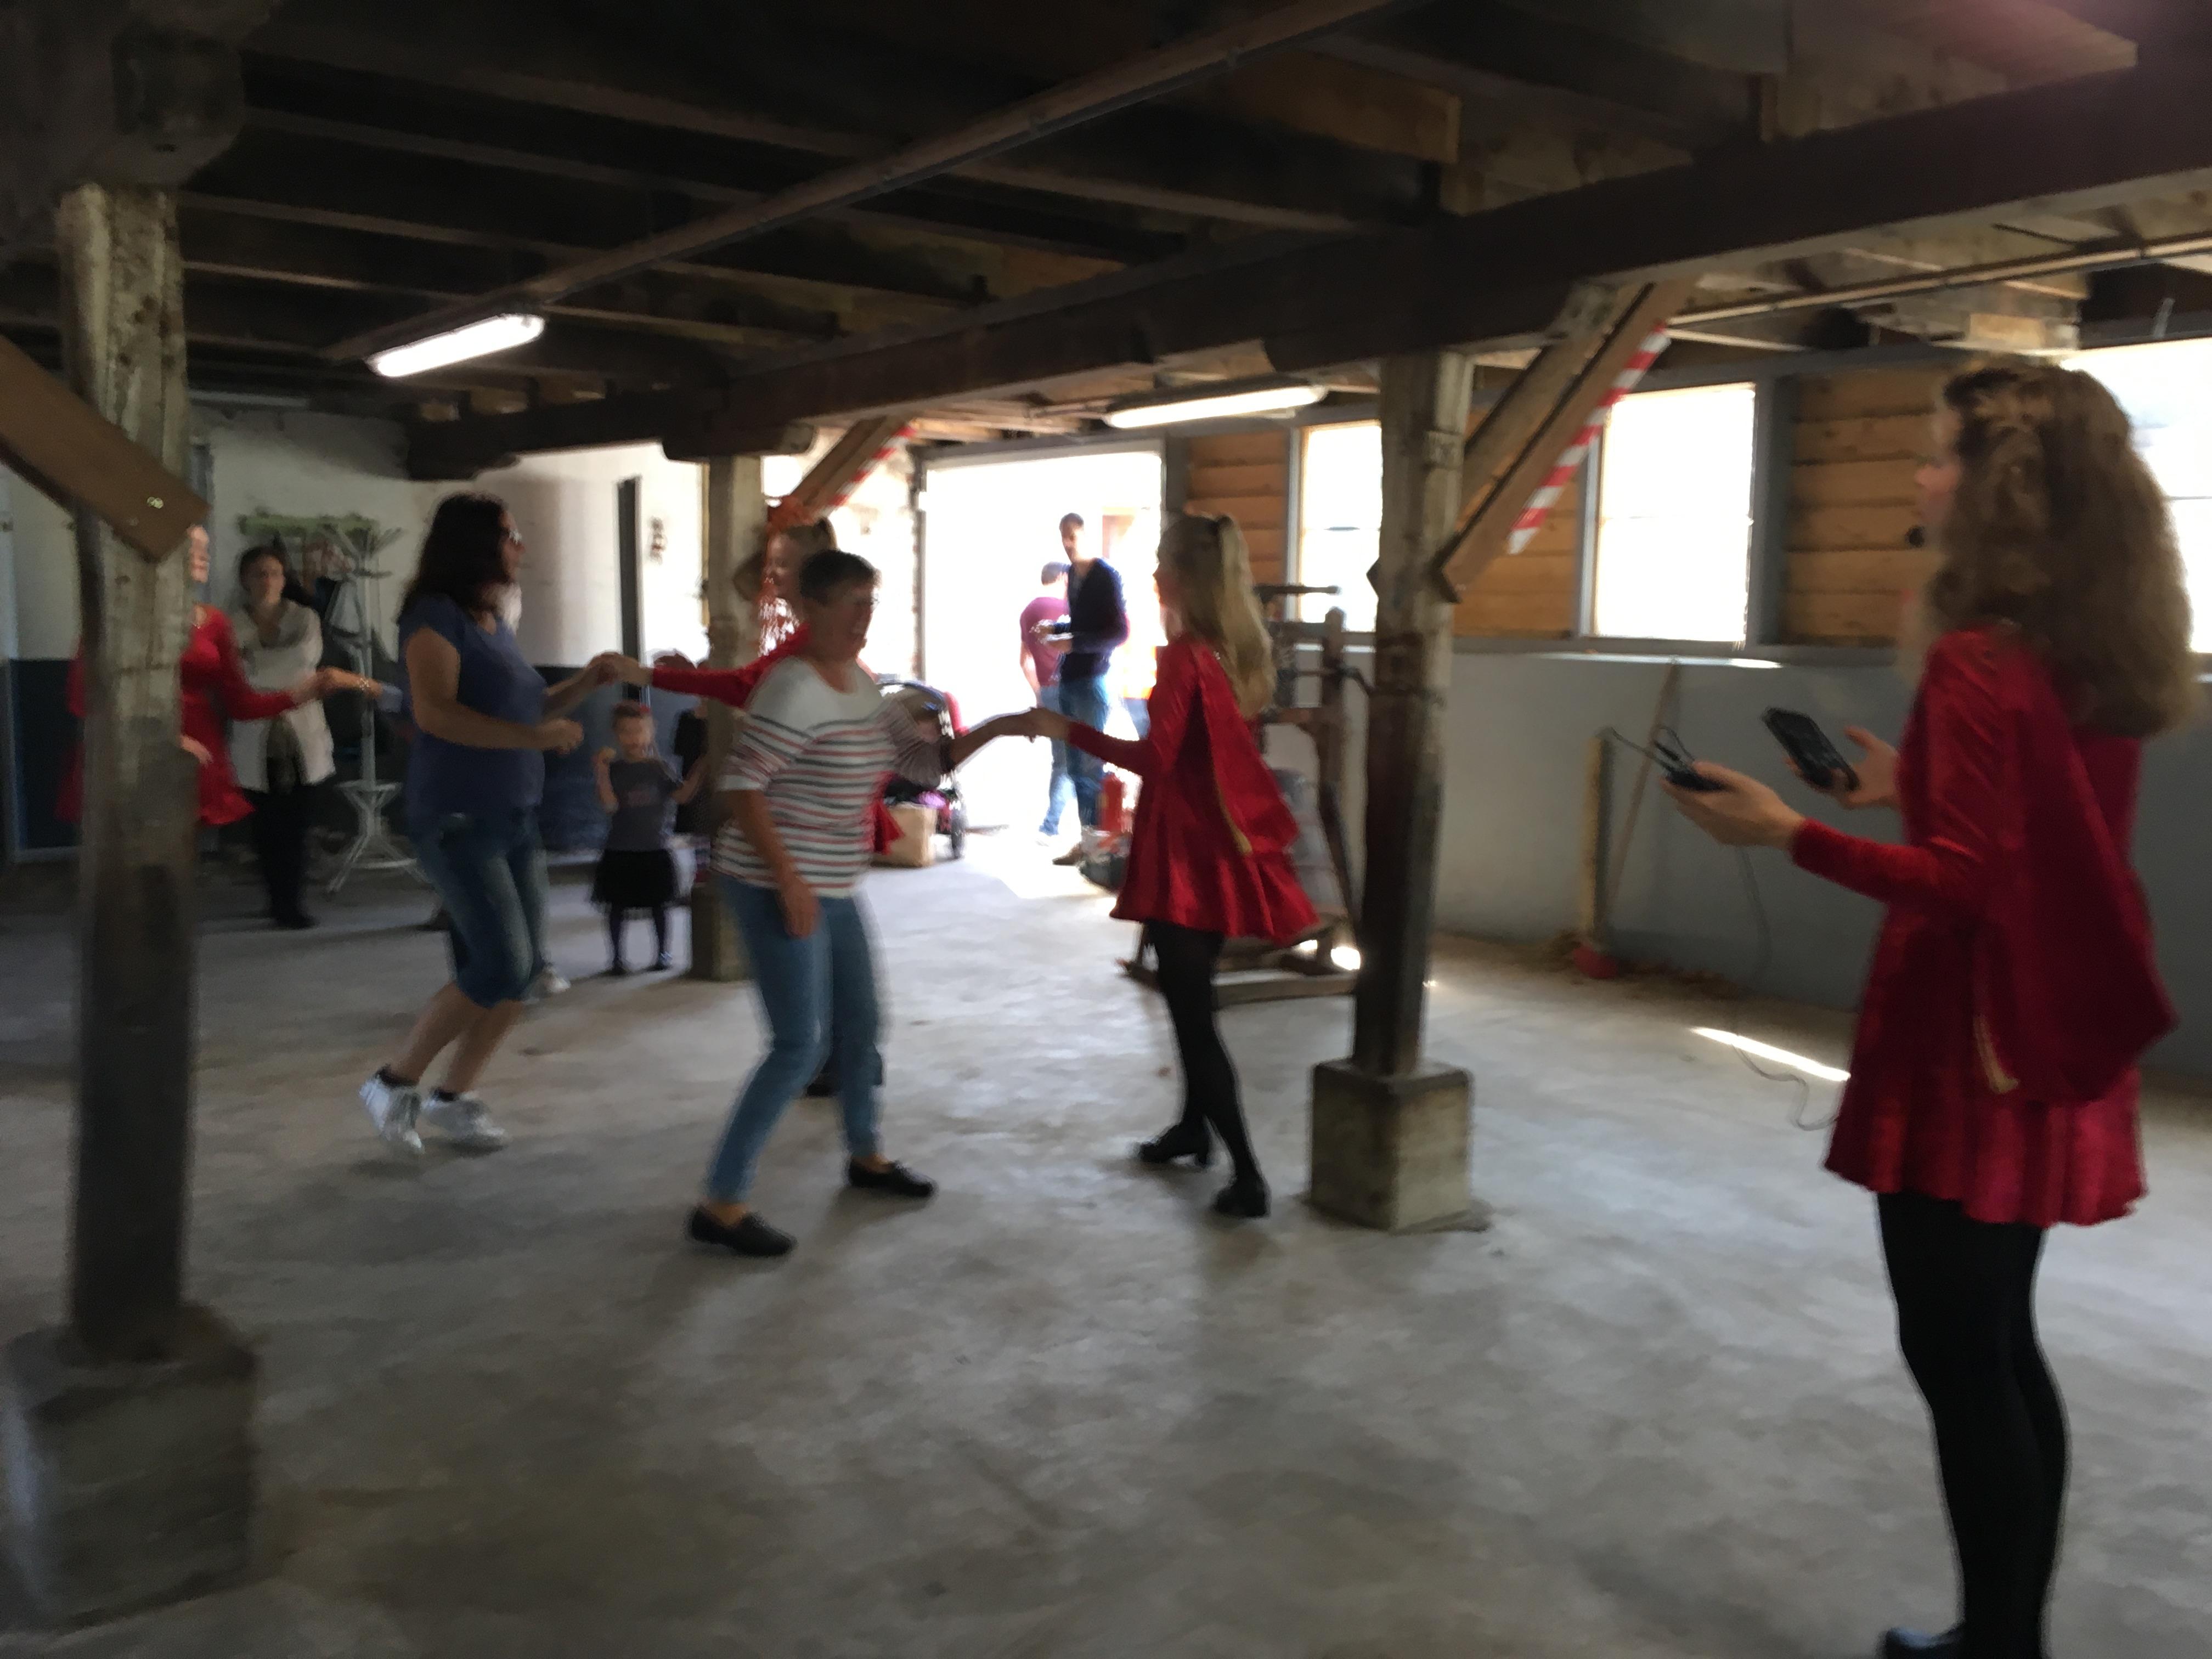 Ierse dansles Maassluis